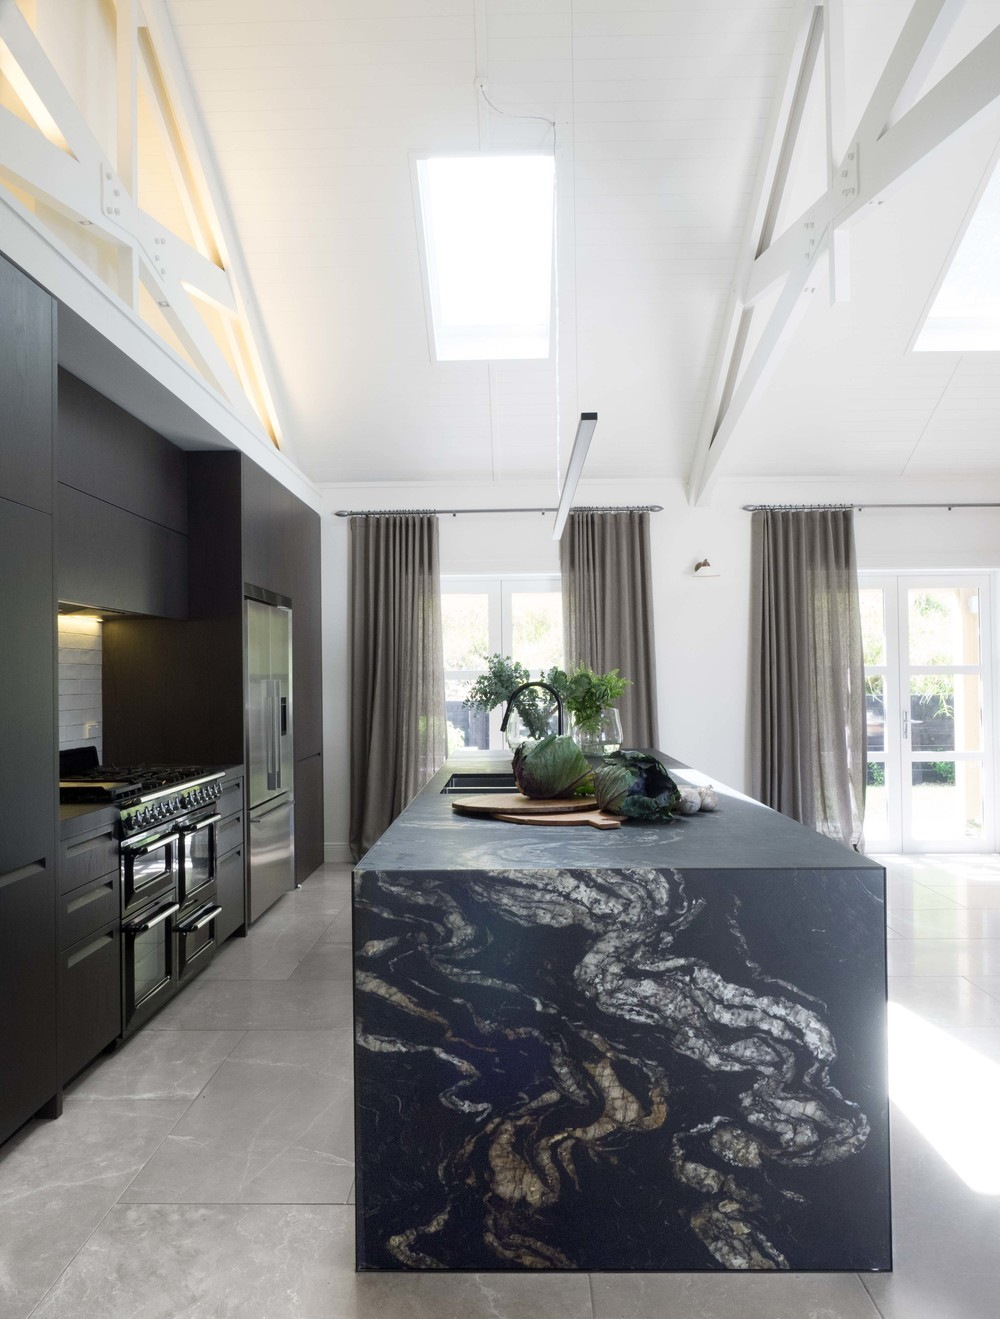 Sonya Cotter Interior Design - Farmhouse Kithen Design